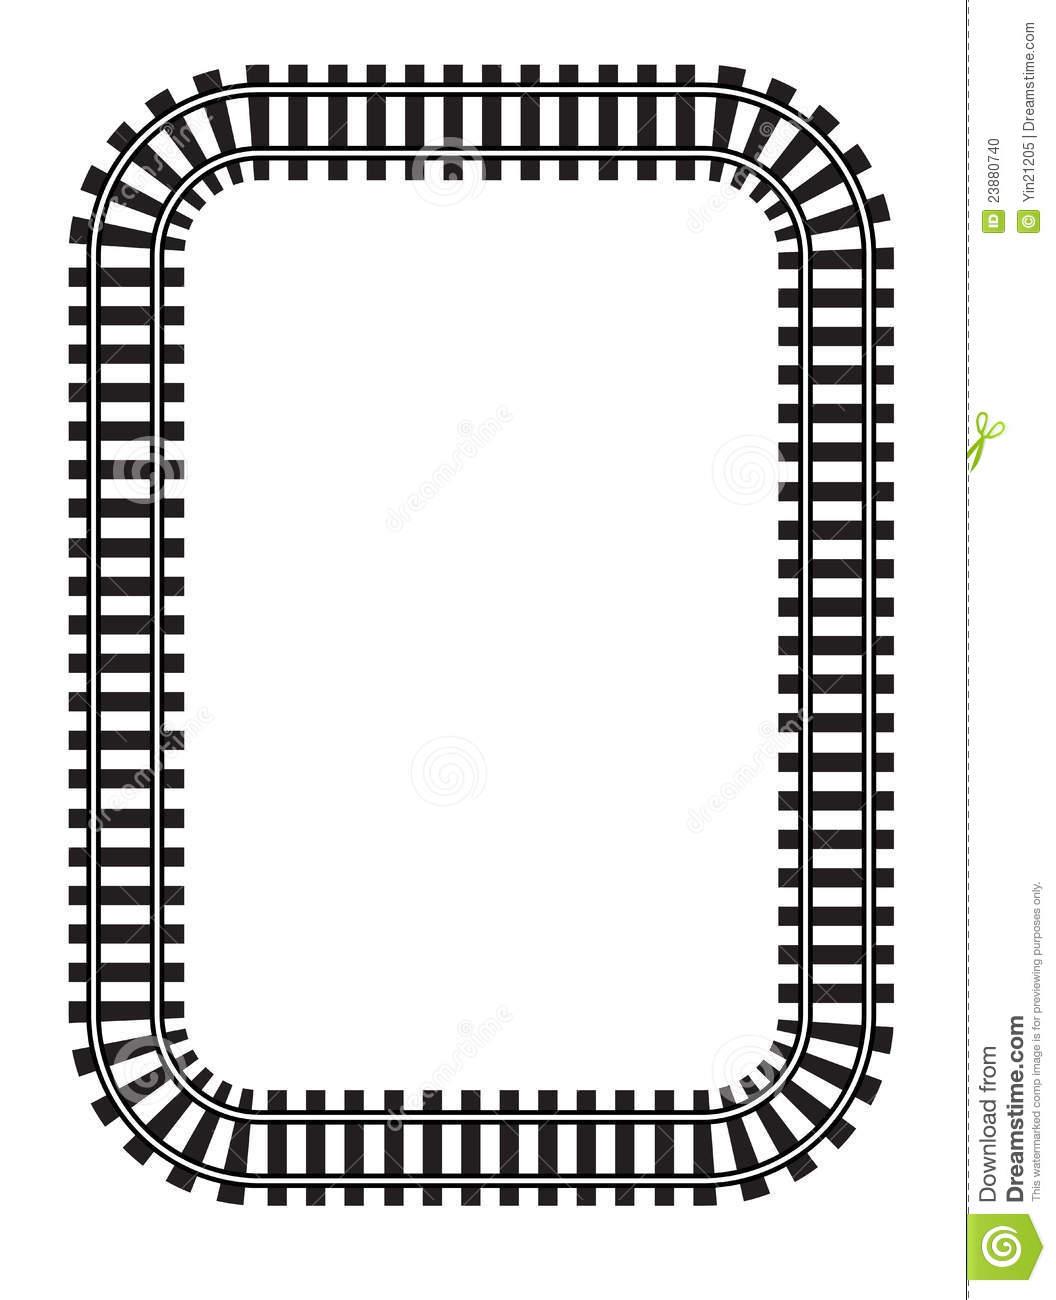 Locomotive clipart border Clipart jpeg 1056 Tracks Gallery